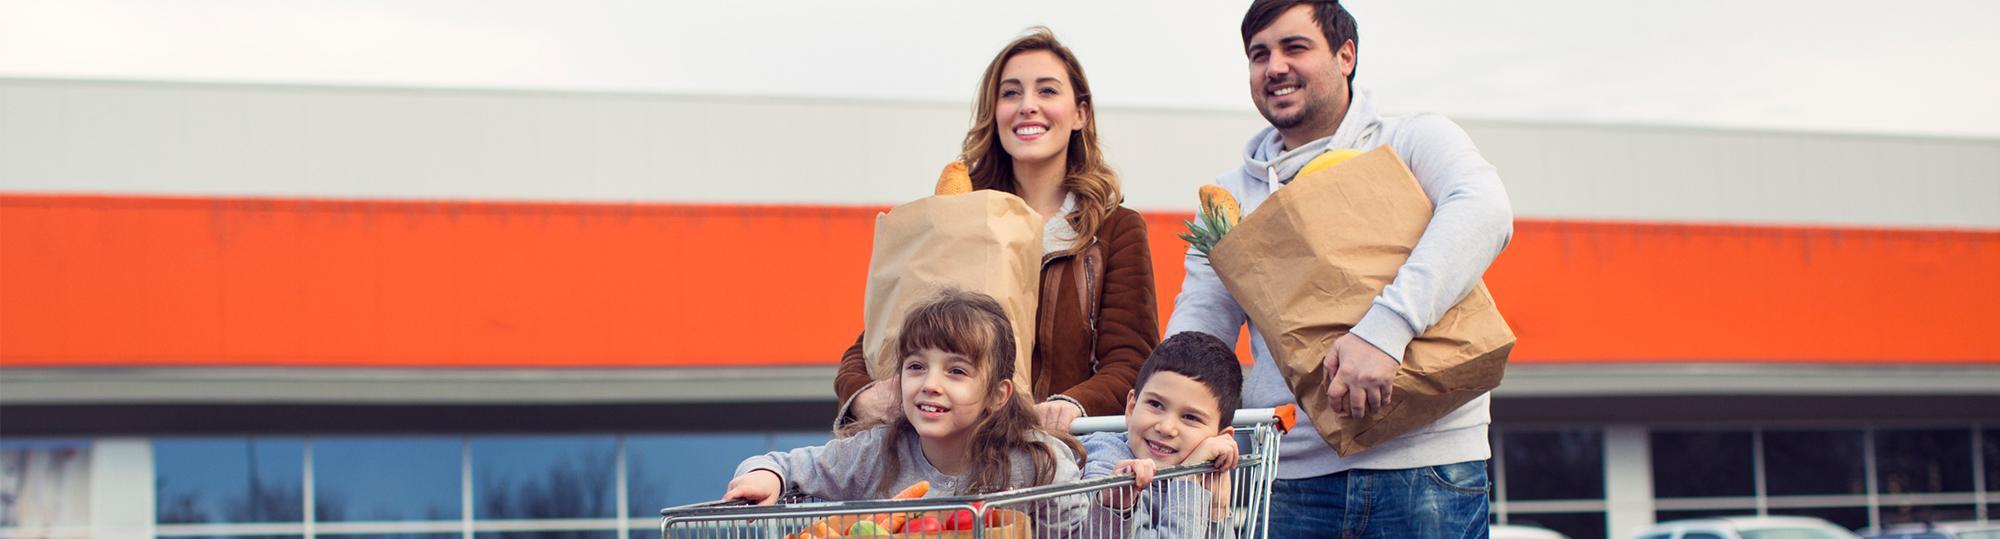 Family Shopping with VetRewards